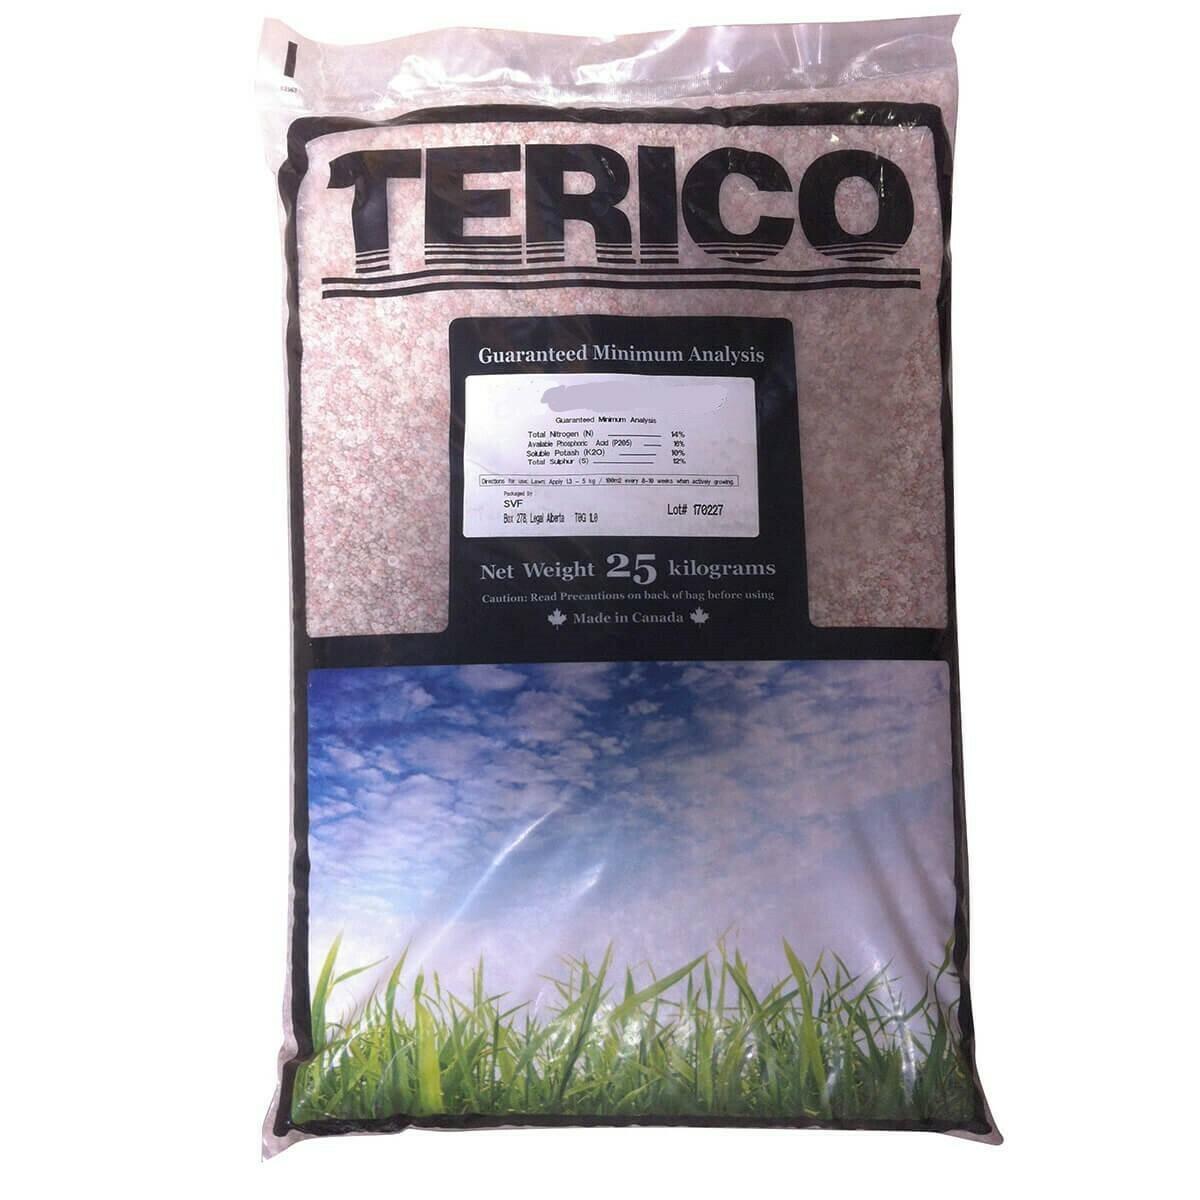 Terico 25-10-12 - 25Kg